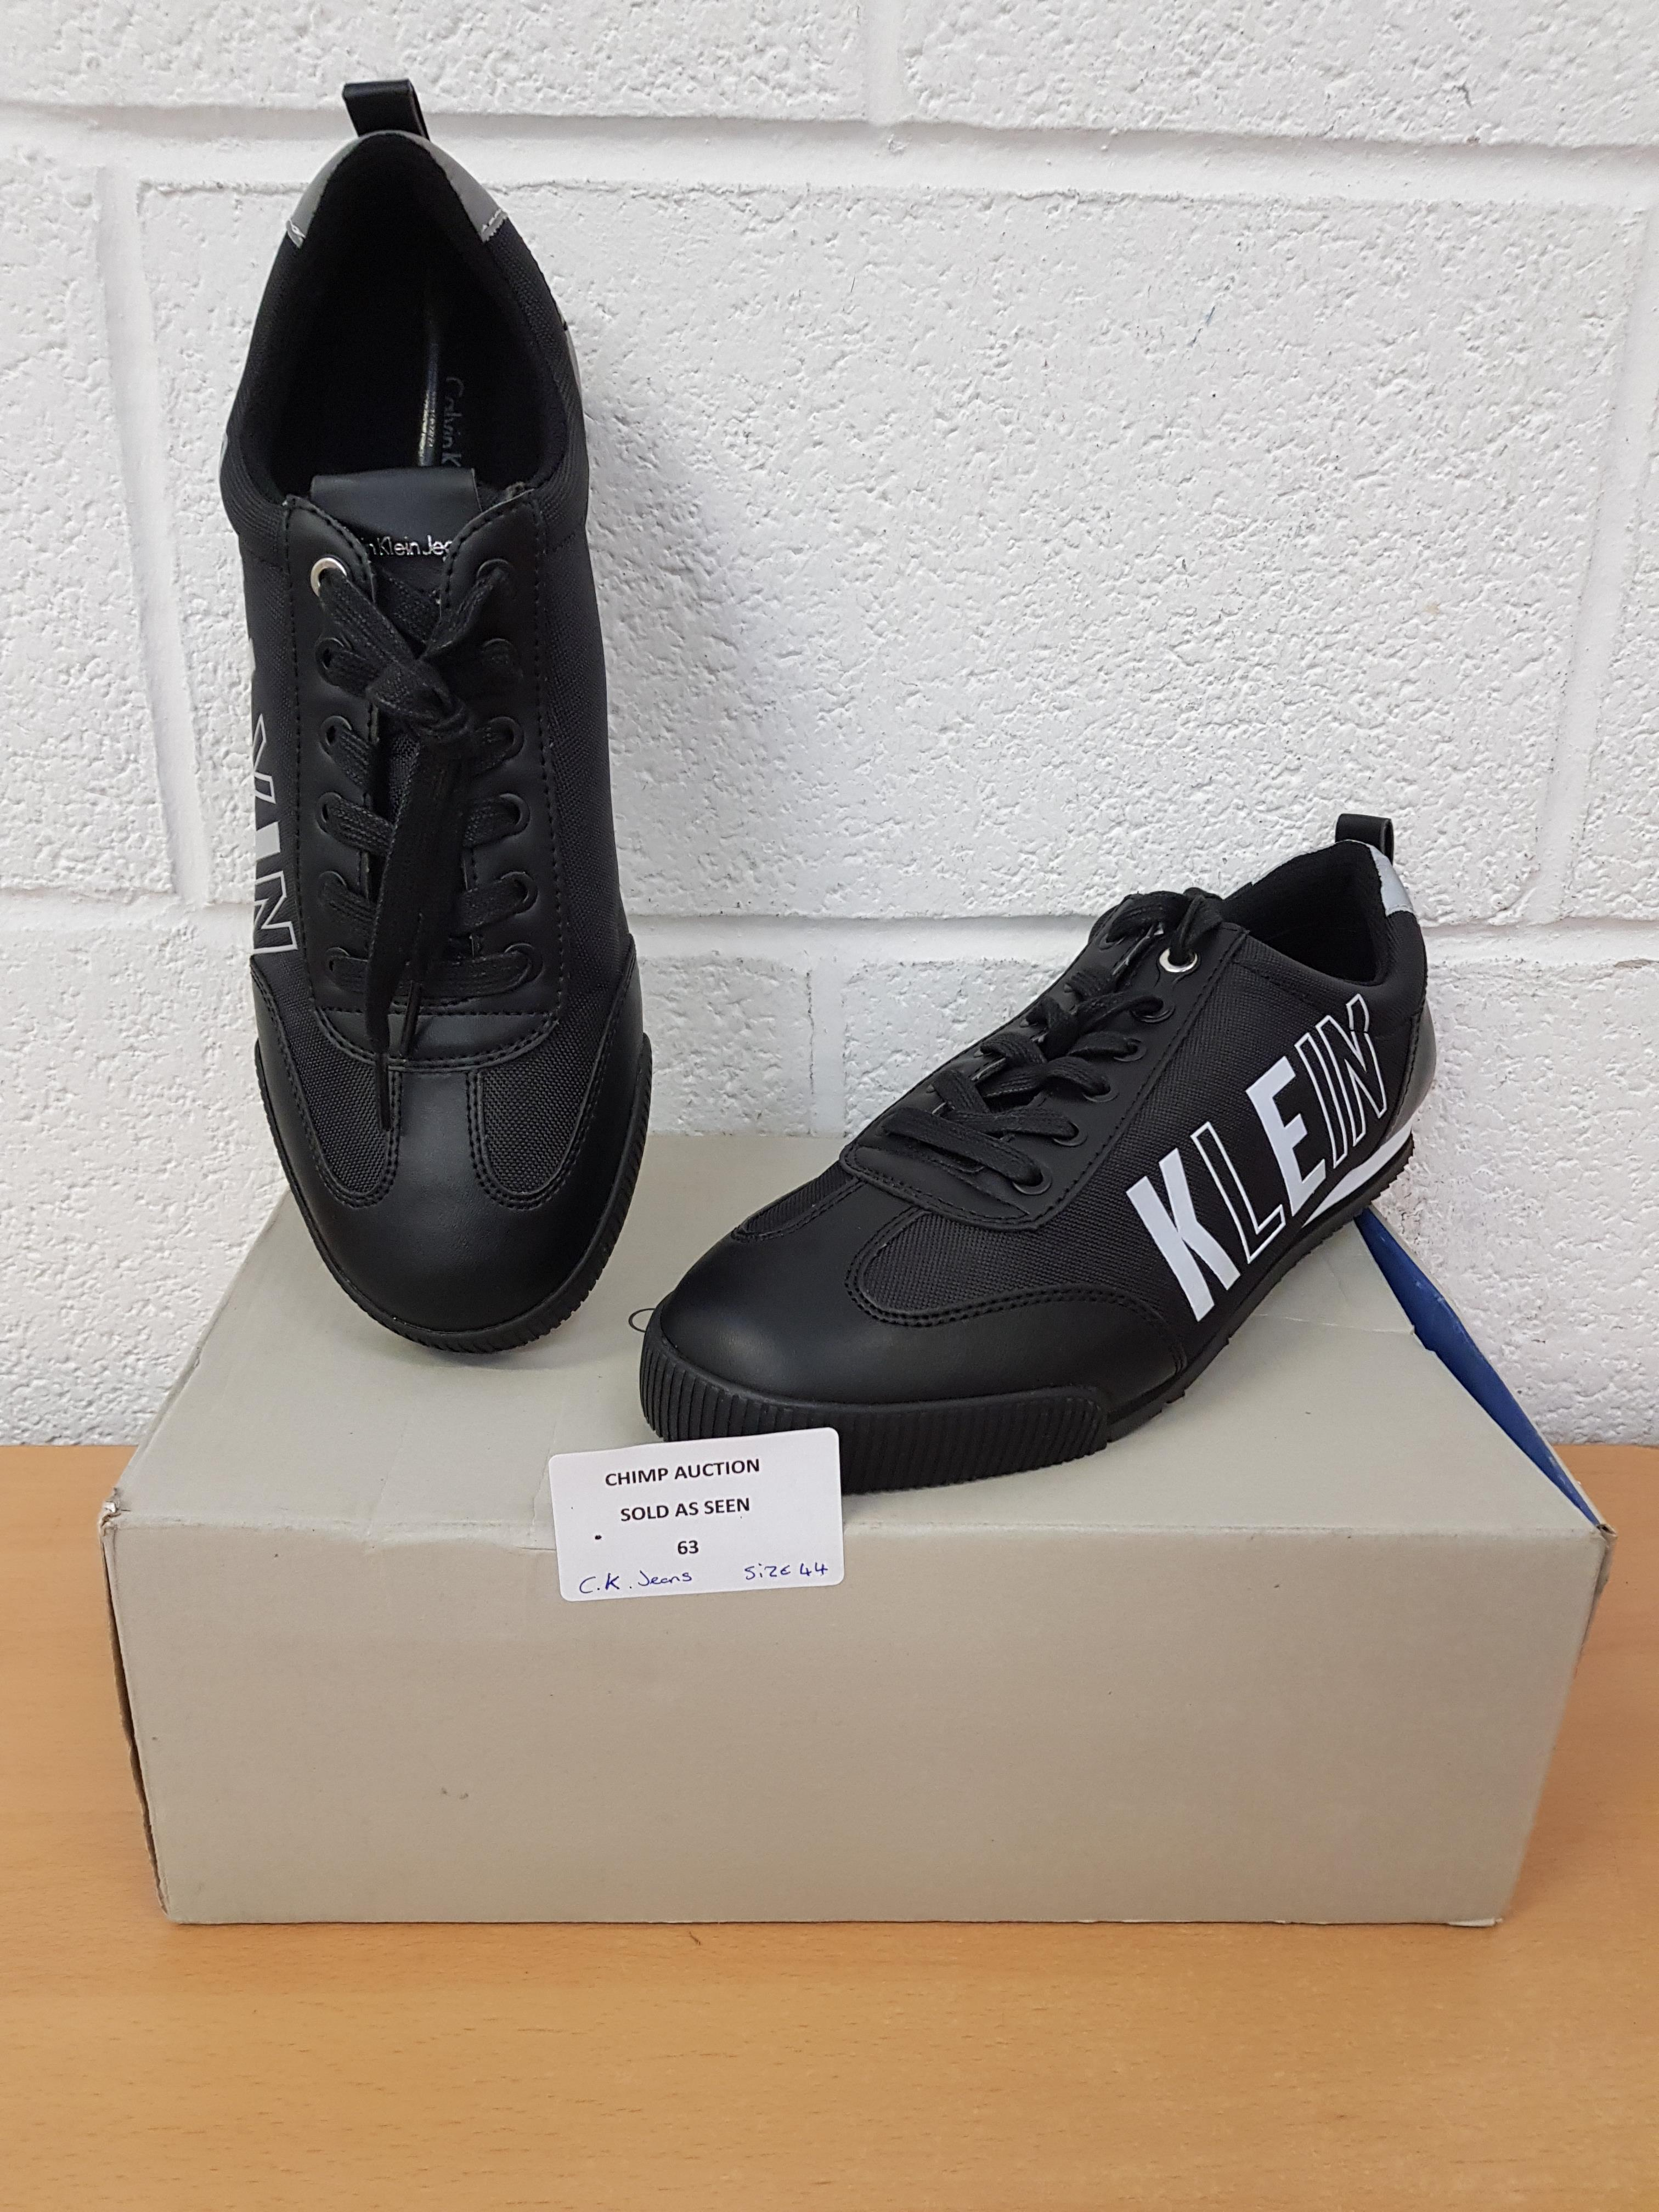 Lot 63 - Brand new Calvin Klein men's trainers EU 44 RRP £129.99